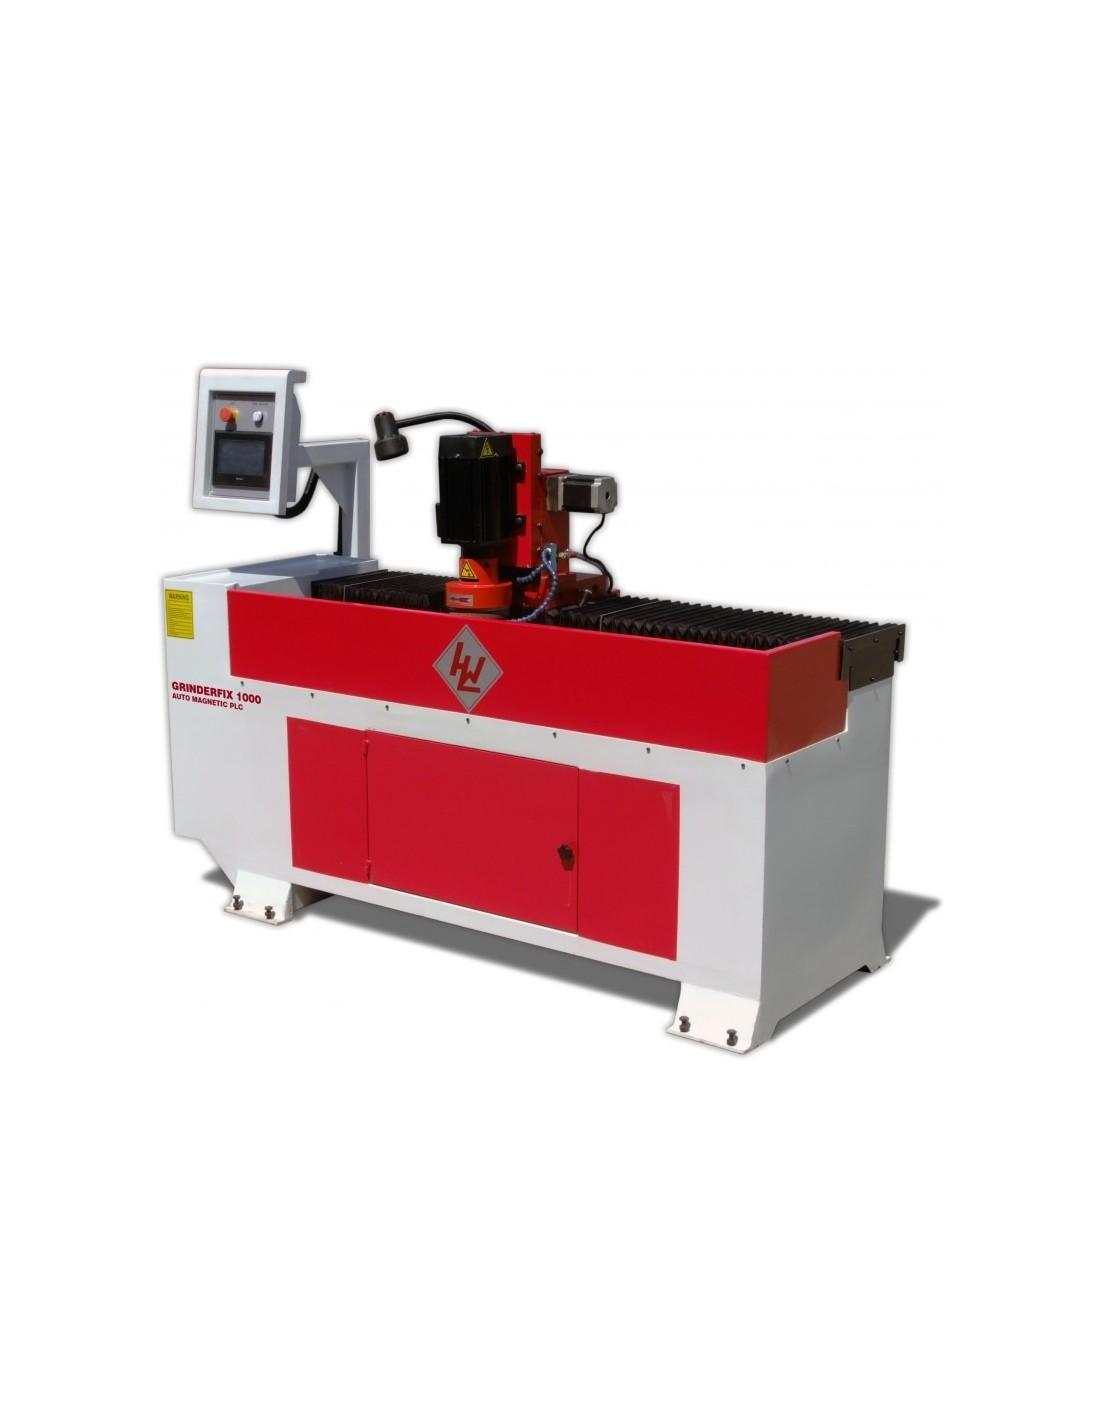 Masina pentru ascutit cutite de abric Winter Grinderfix 1000 Auto Magnetic PLC